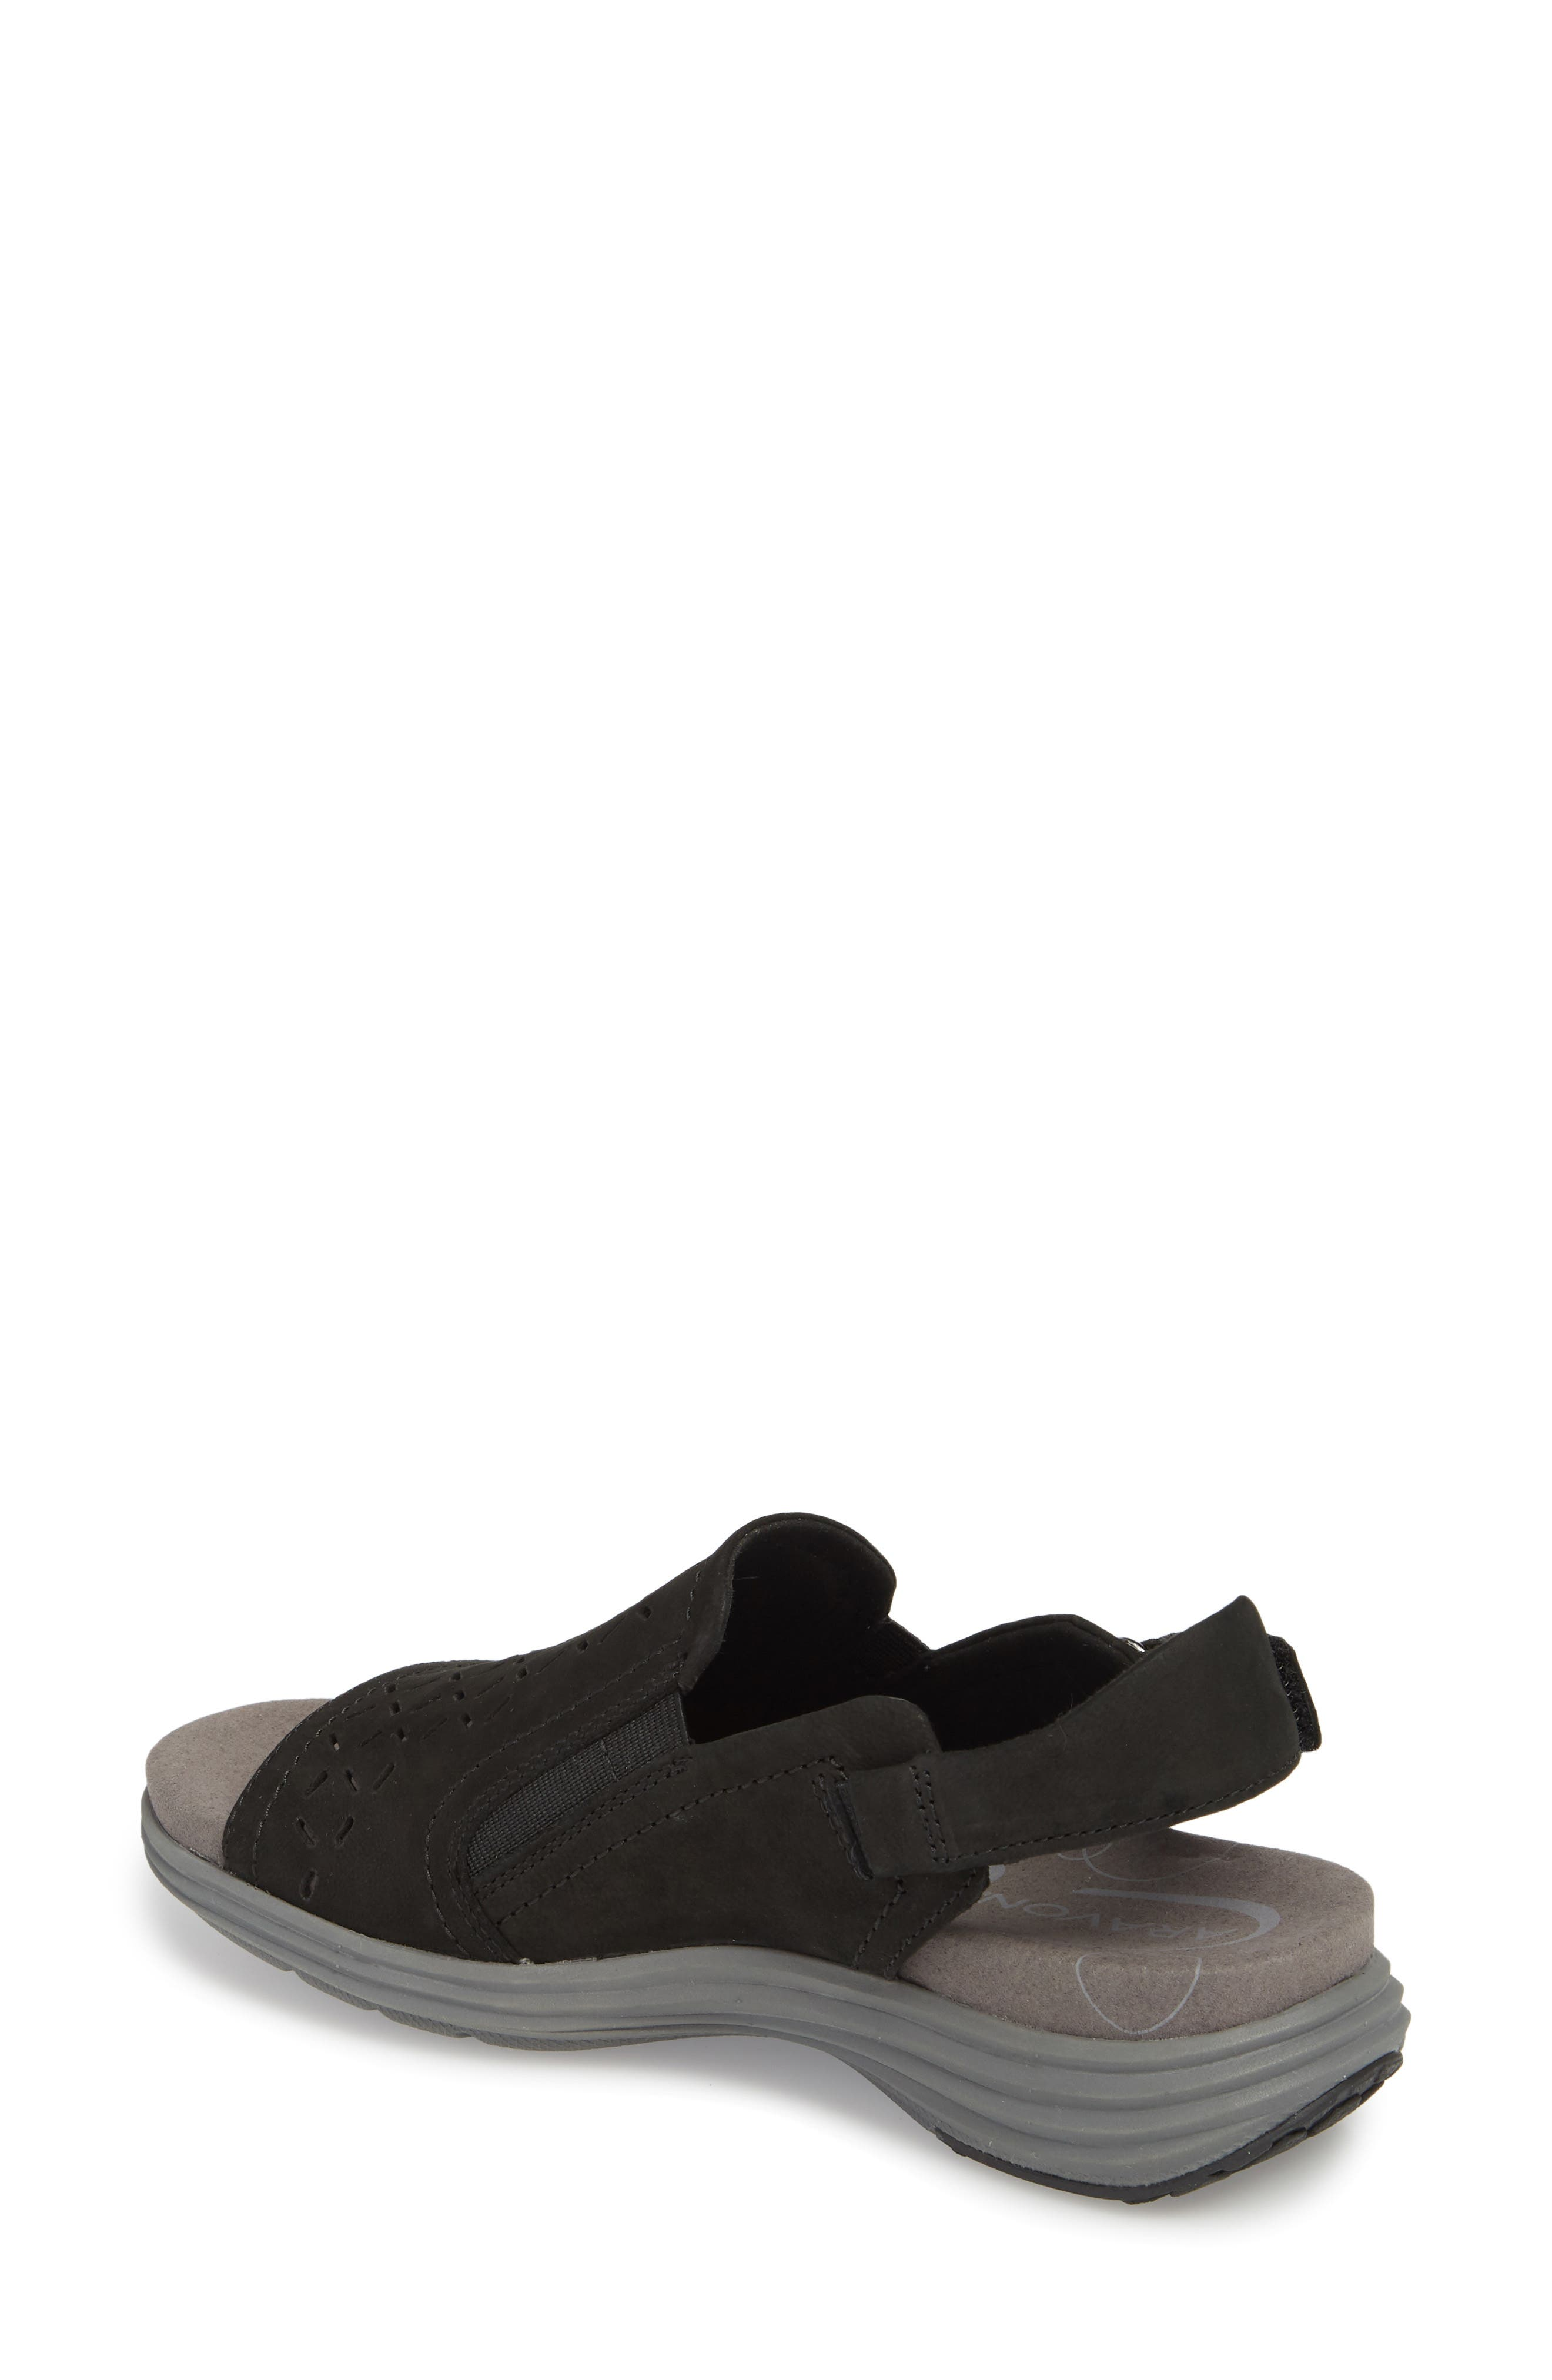 Beaumont Slingback Sandal,                             Alternate thumbnail 2, color,                             Black Nubuck Leather